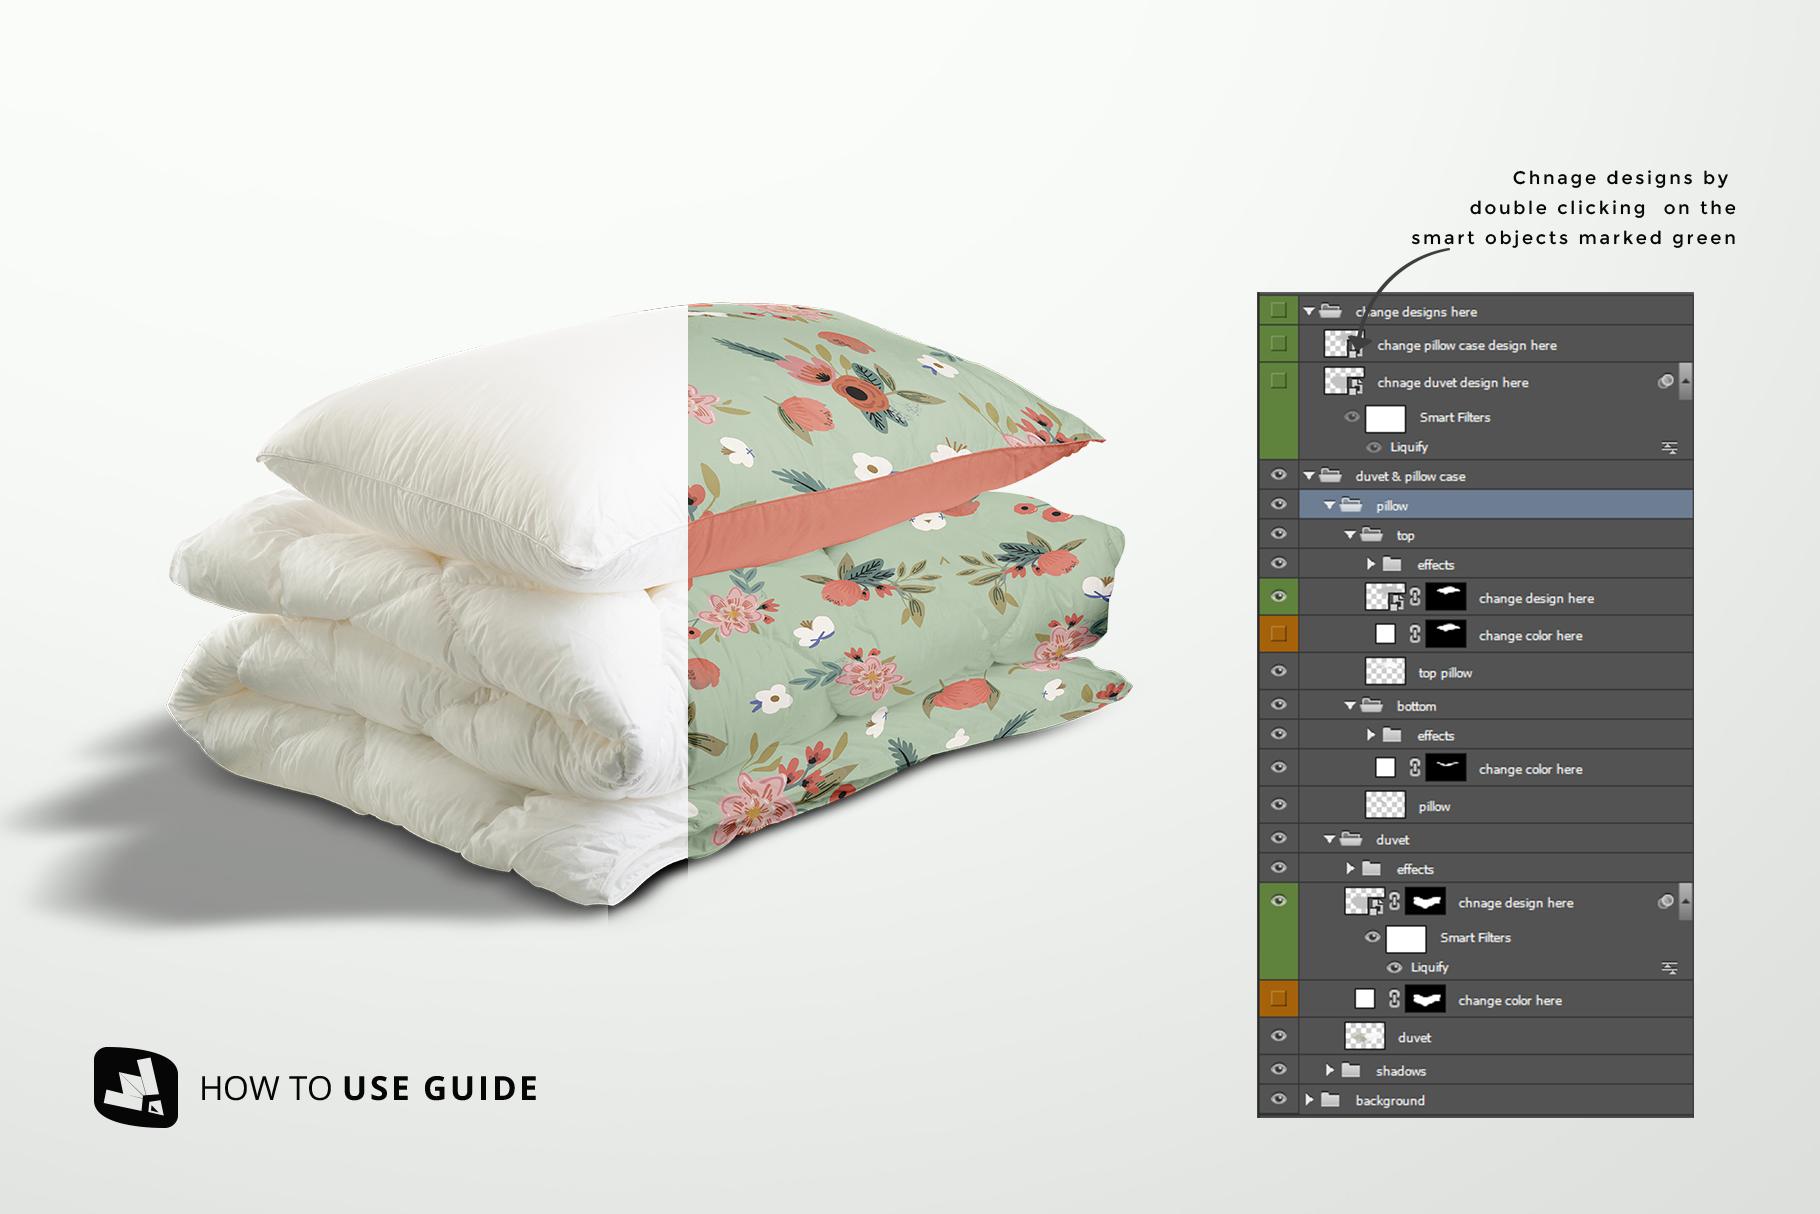 how to change design of the duvet & pillow case mockup